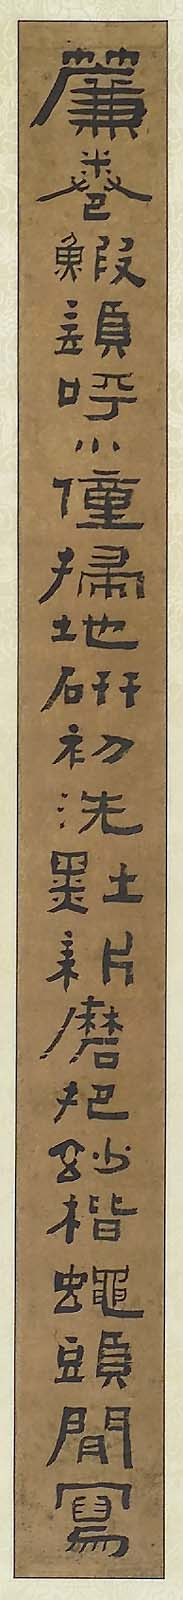 Calligraphy Museum Of Fine Arts Boston